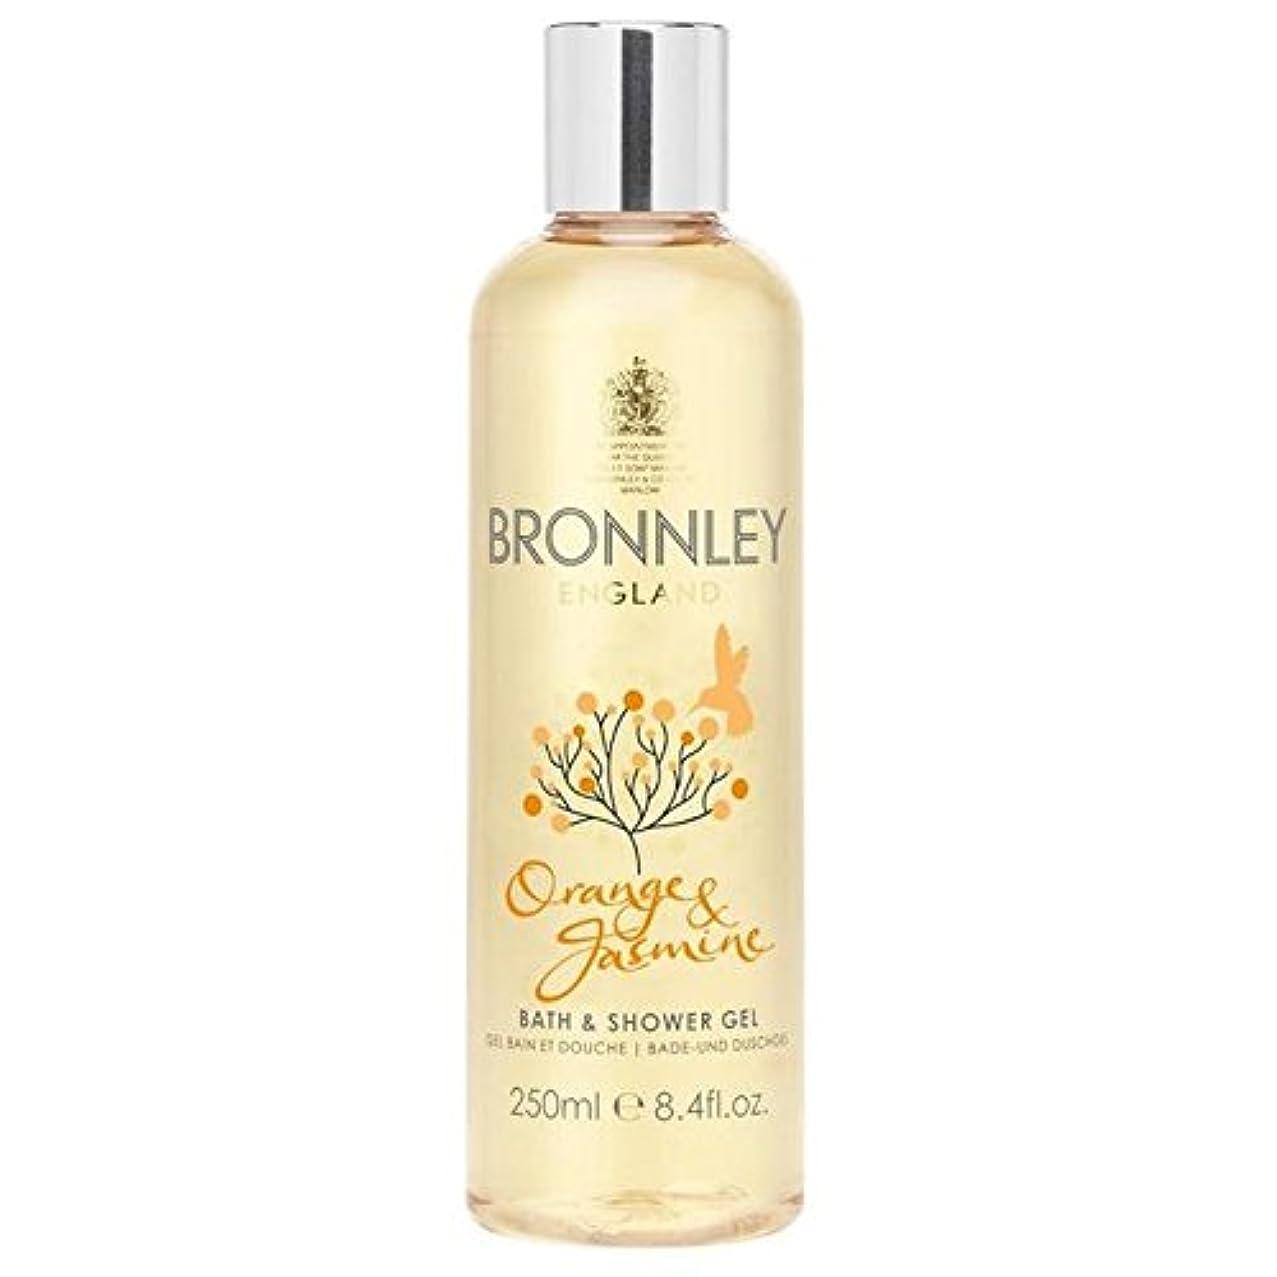 Bronnley Orange & Jasmine Bath & Shower Gel 250ml - オレンジ&ジャスミンバス&シャワージェル250ミリリットル [並行輸入品]